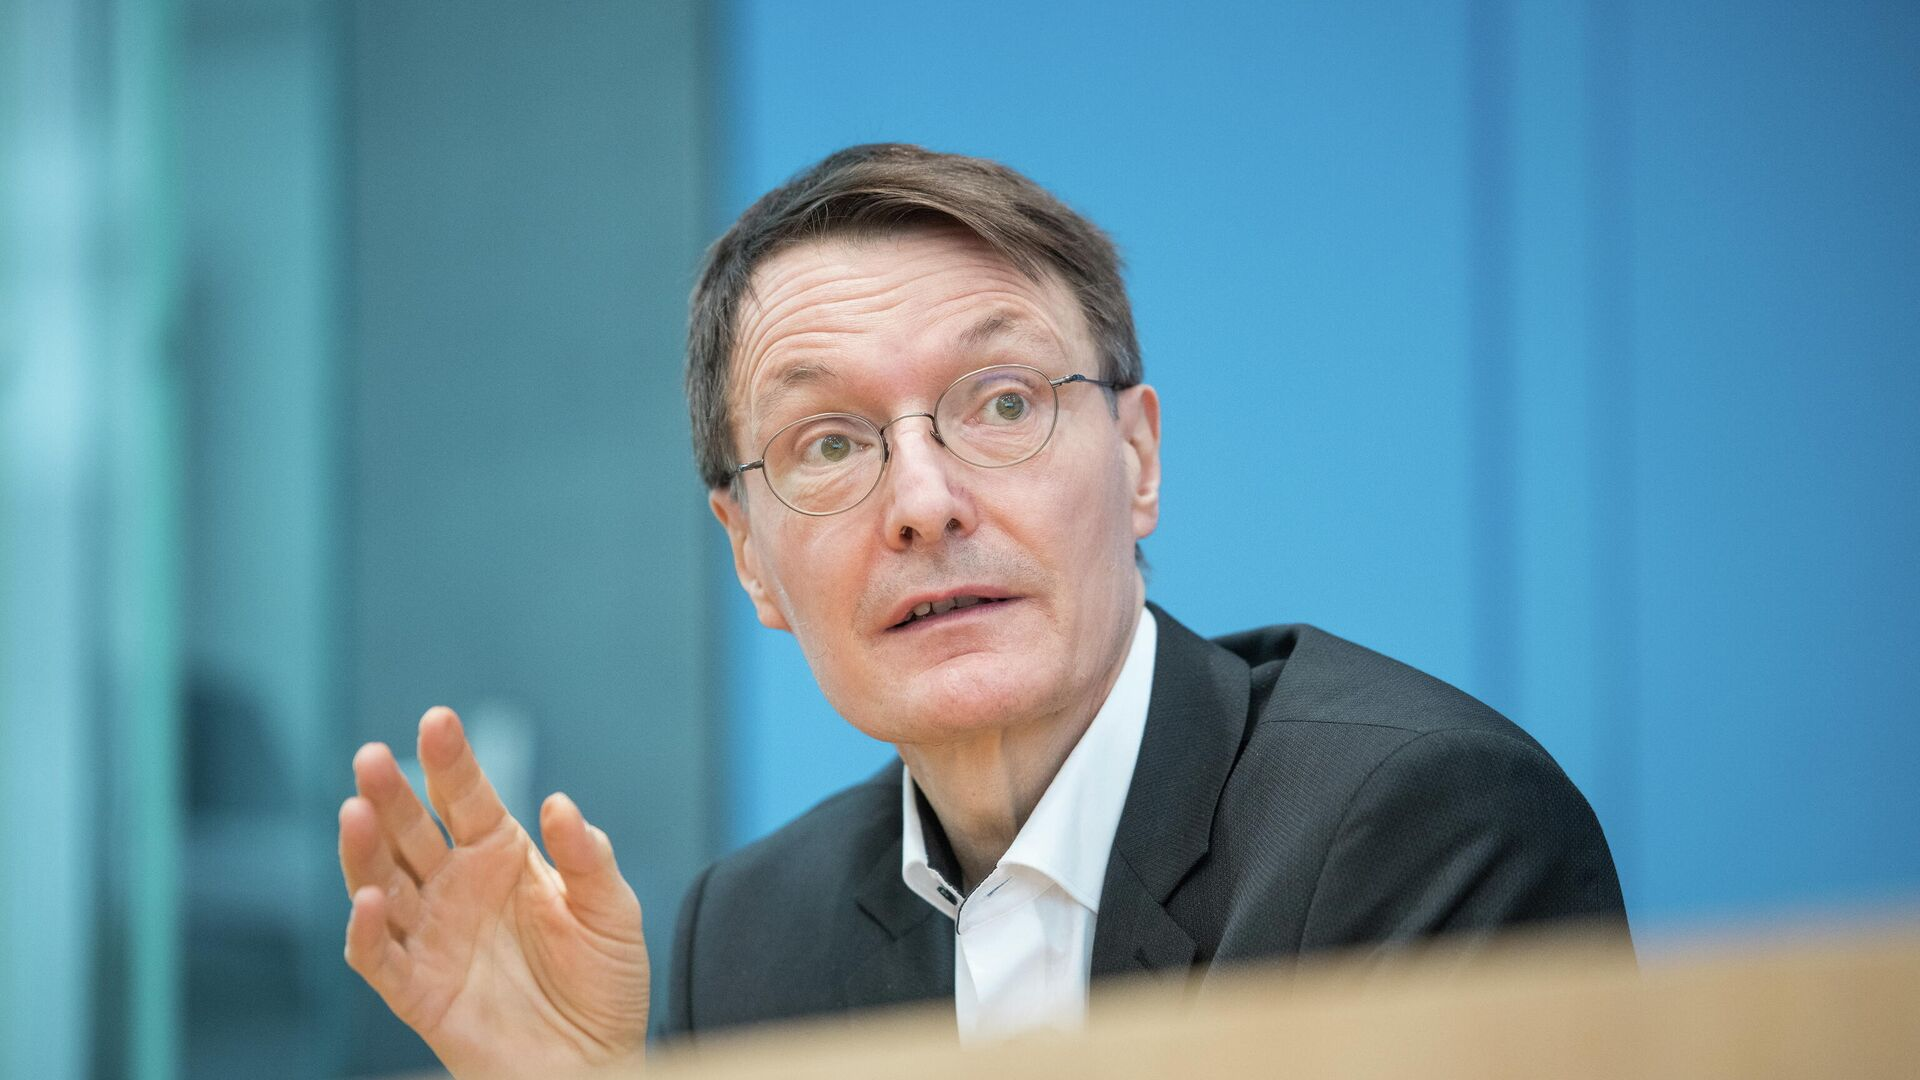 SPD-Politiker Karl Lauterbach - SNA, 1920, 31.03.2021